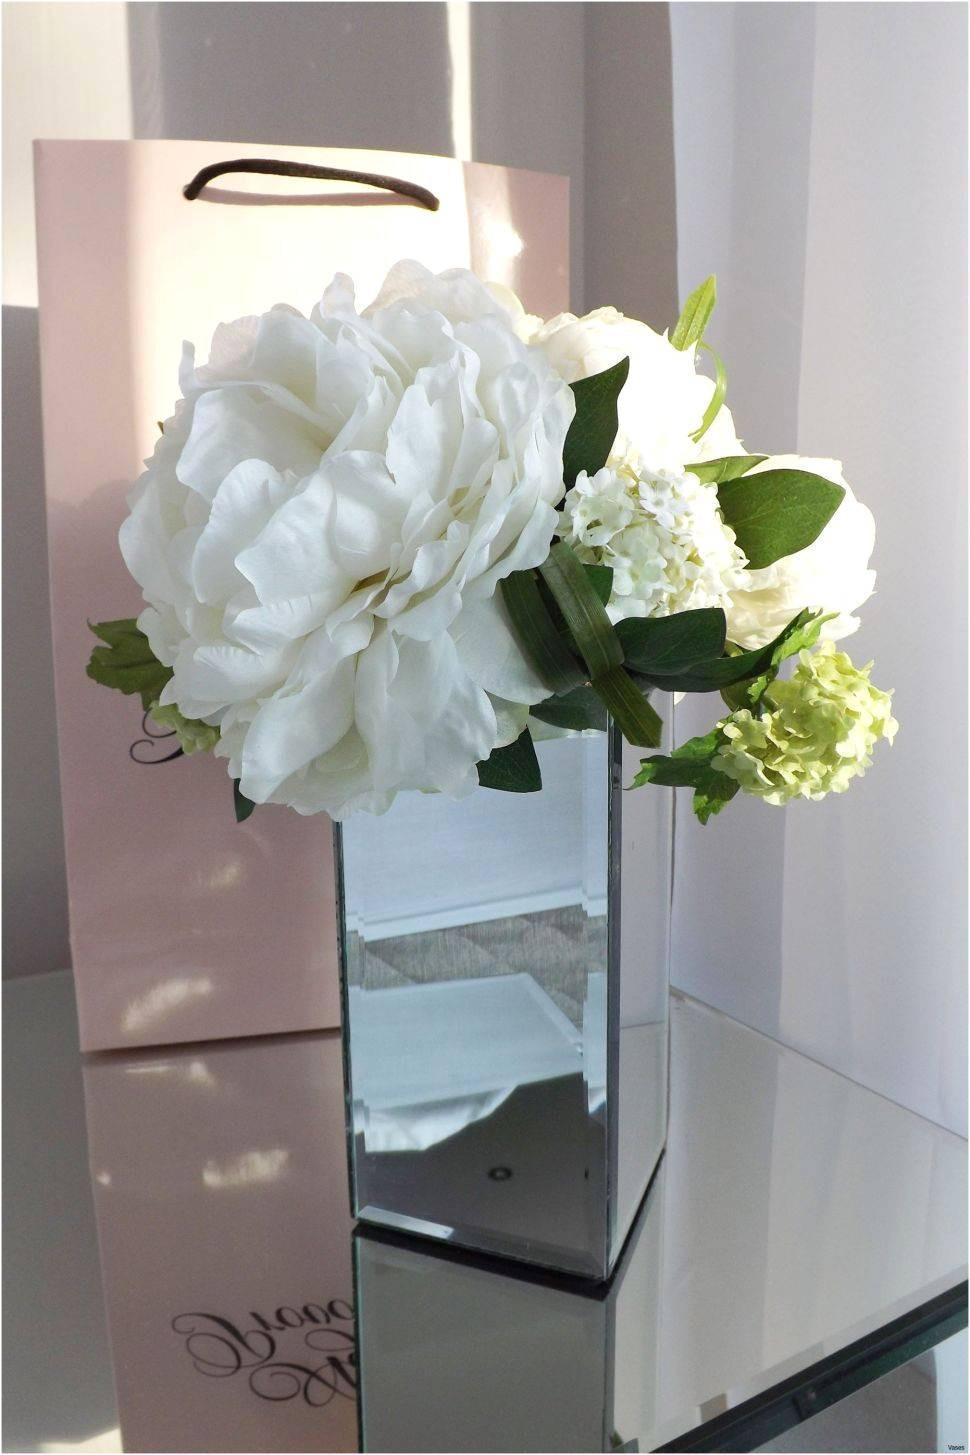 tall silk flower arrangements in vases of vase centerpieces for wedding lovely silk flowers metal vases 3h with regard to vase centerpieces for wedding lovely silk flowers metal vases 3h mirrored mosaic vase votivei 0d design